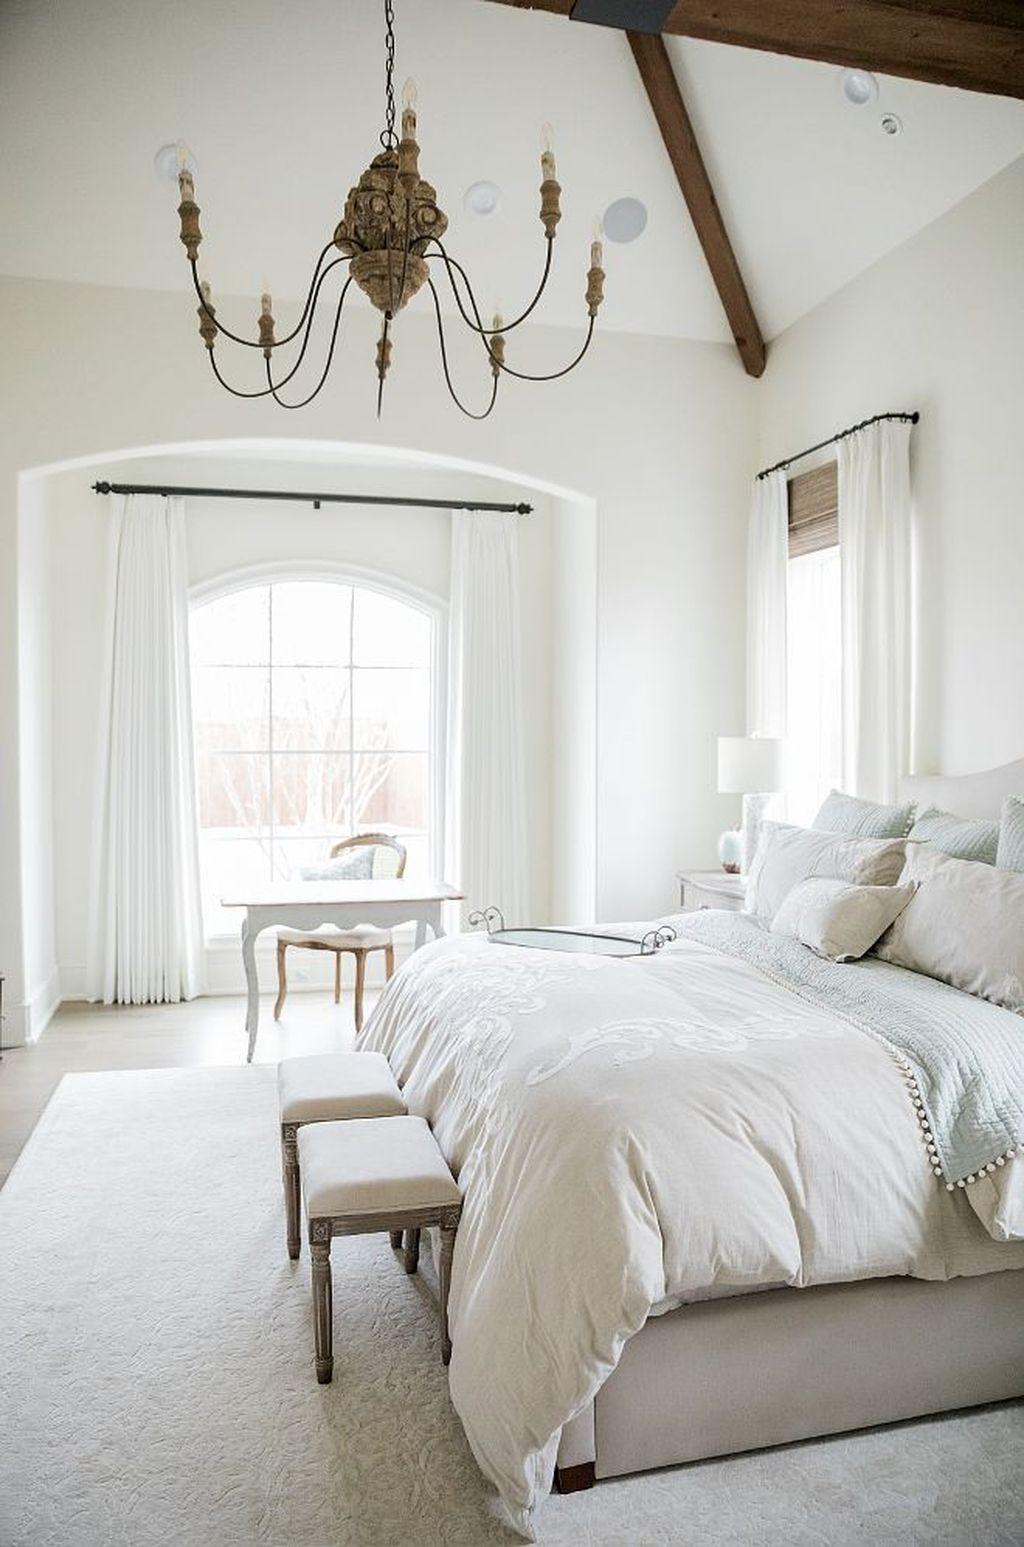 20 Stylish Bedroom Chandeliers Ideas French Bedroom Decor